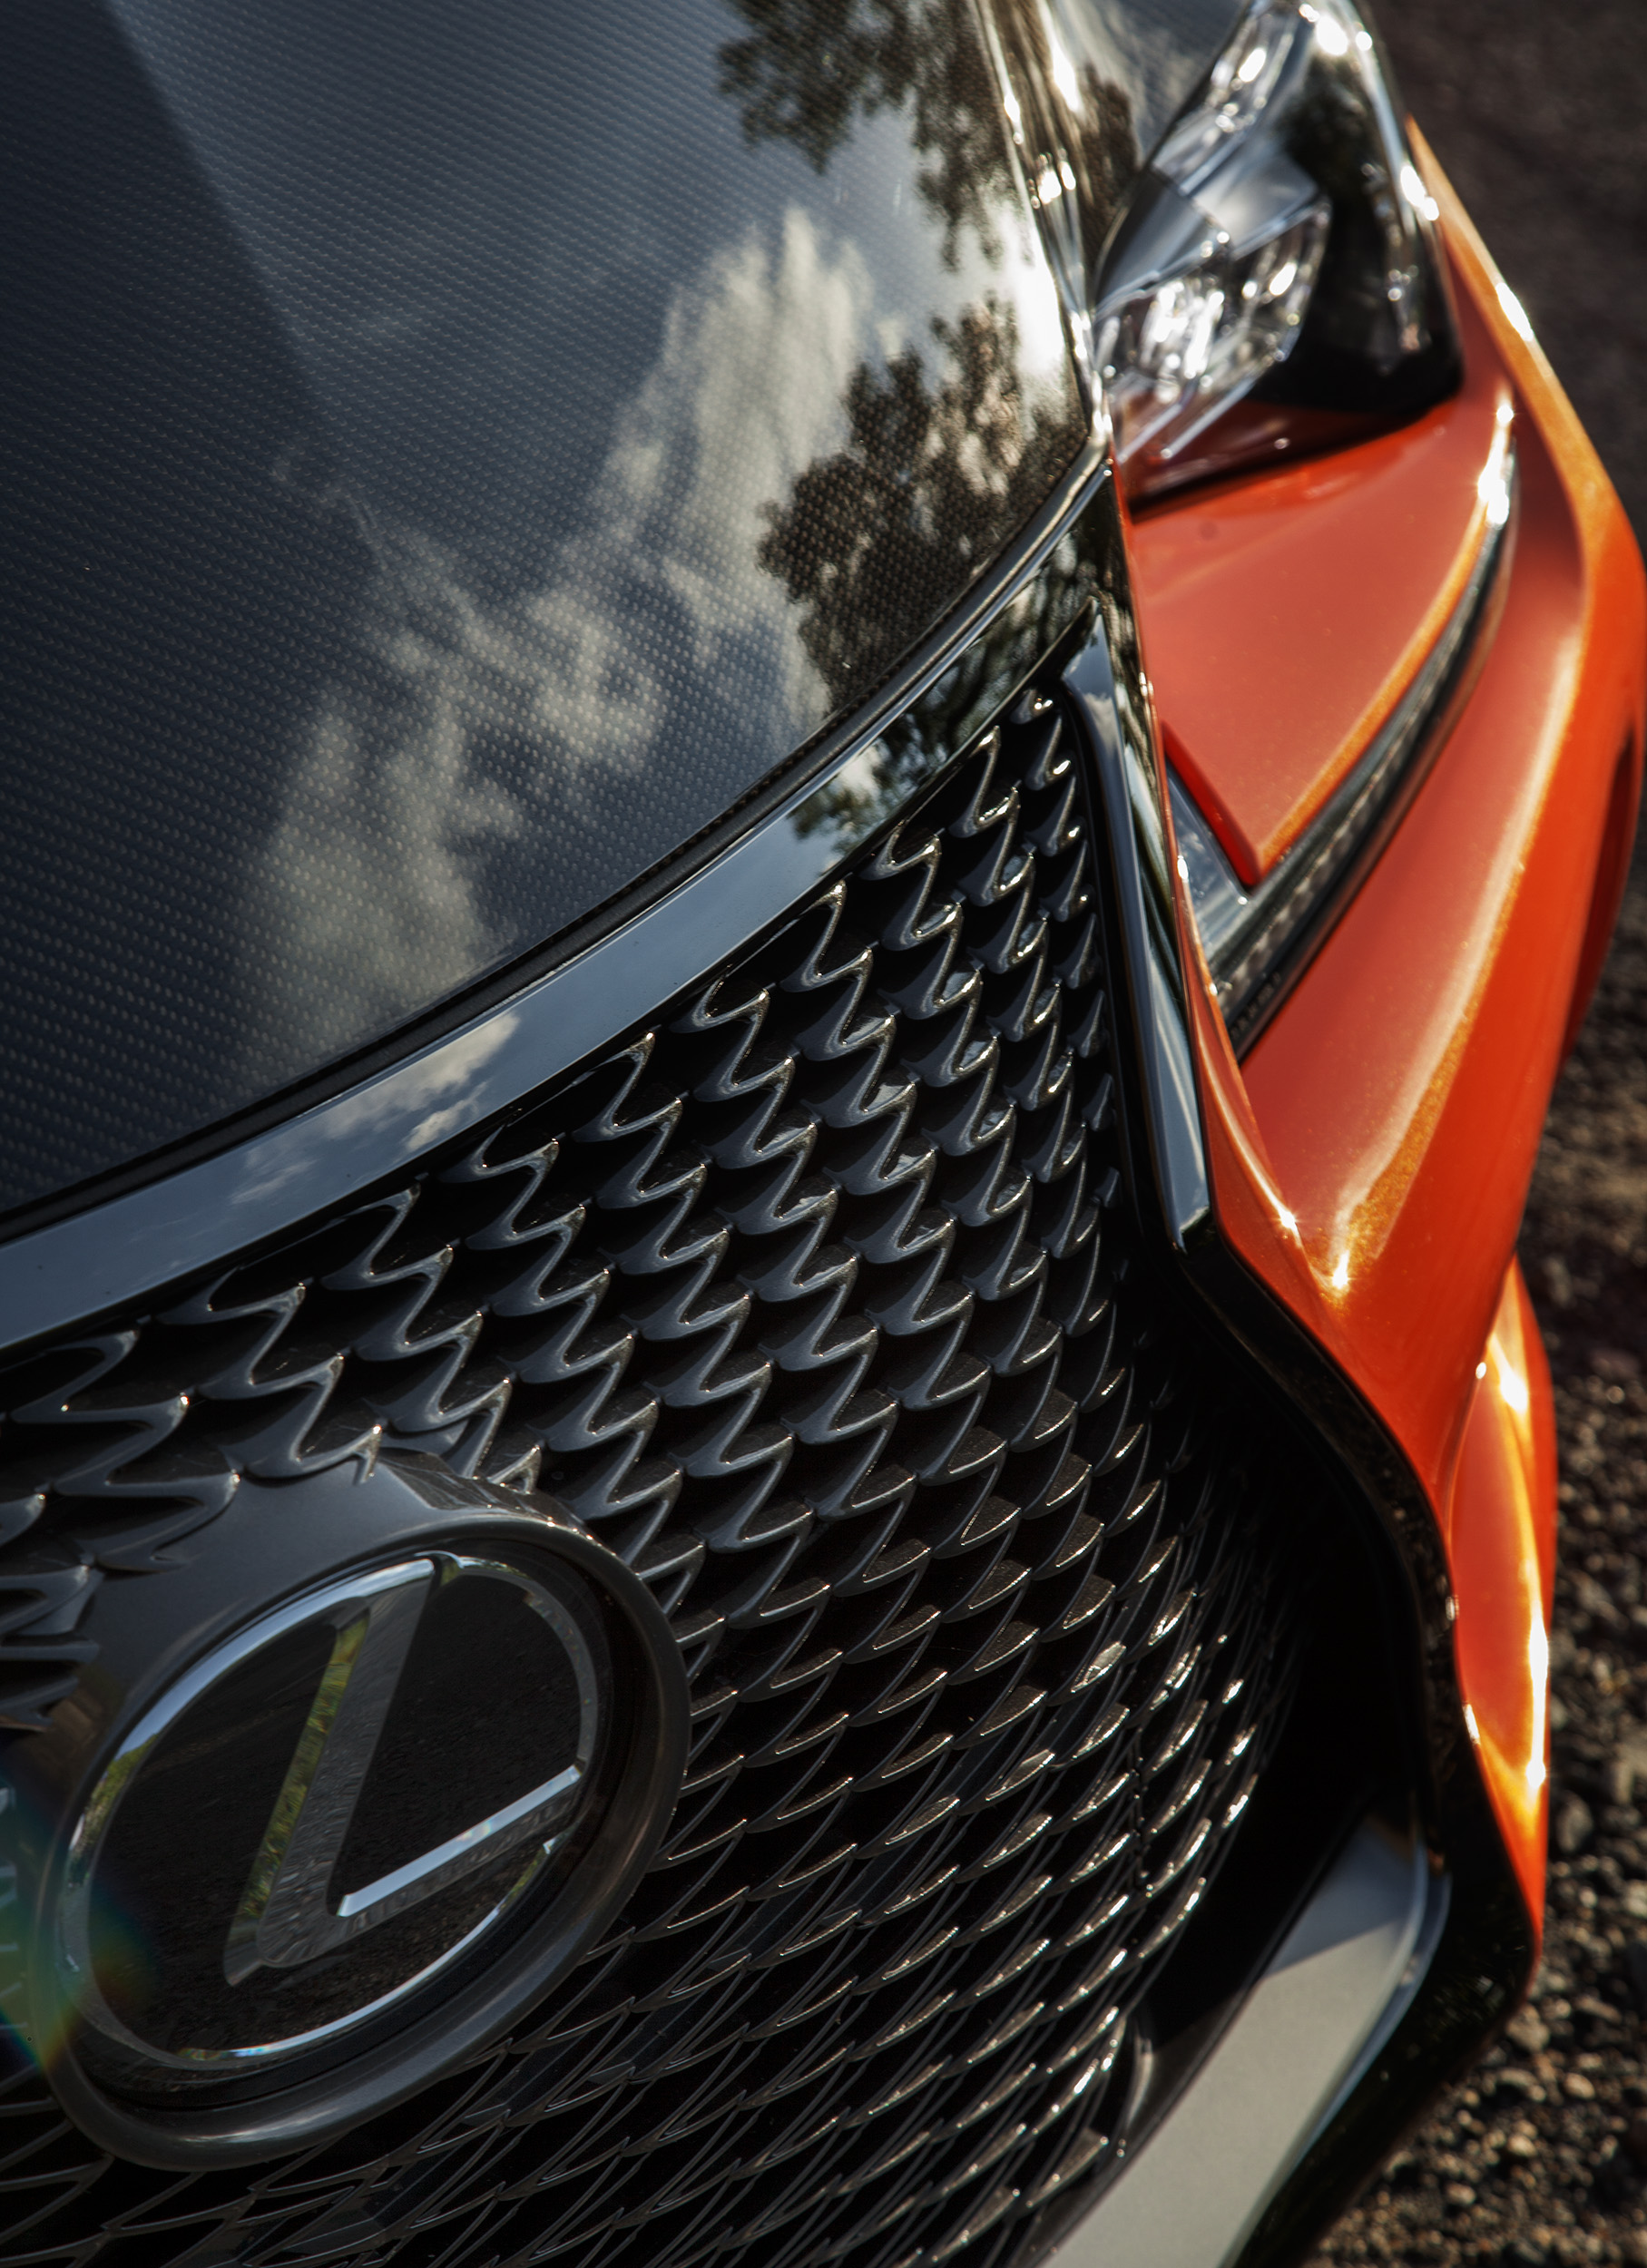 09_Lexus_Landscape_098.jpg